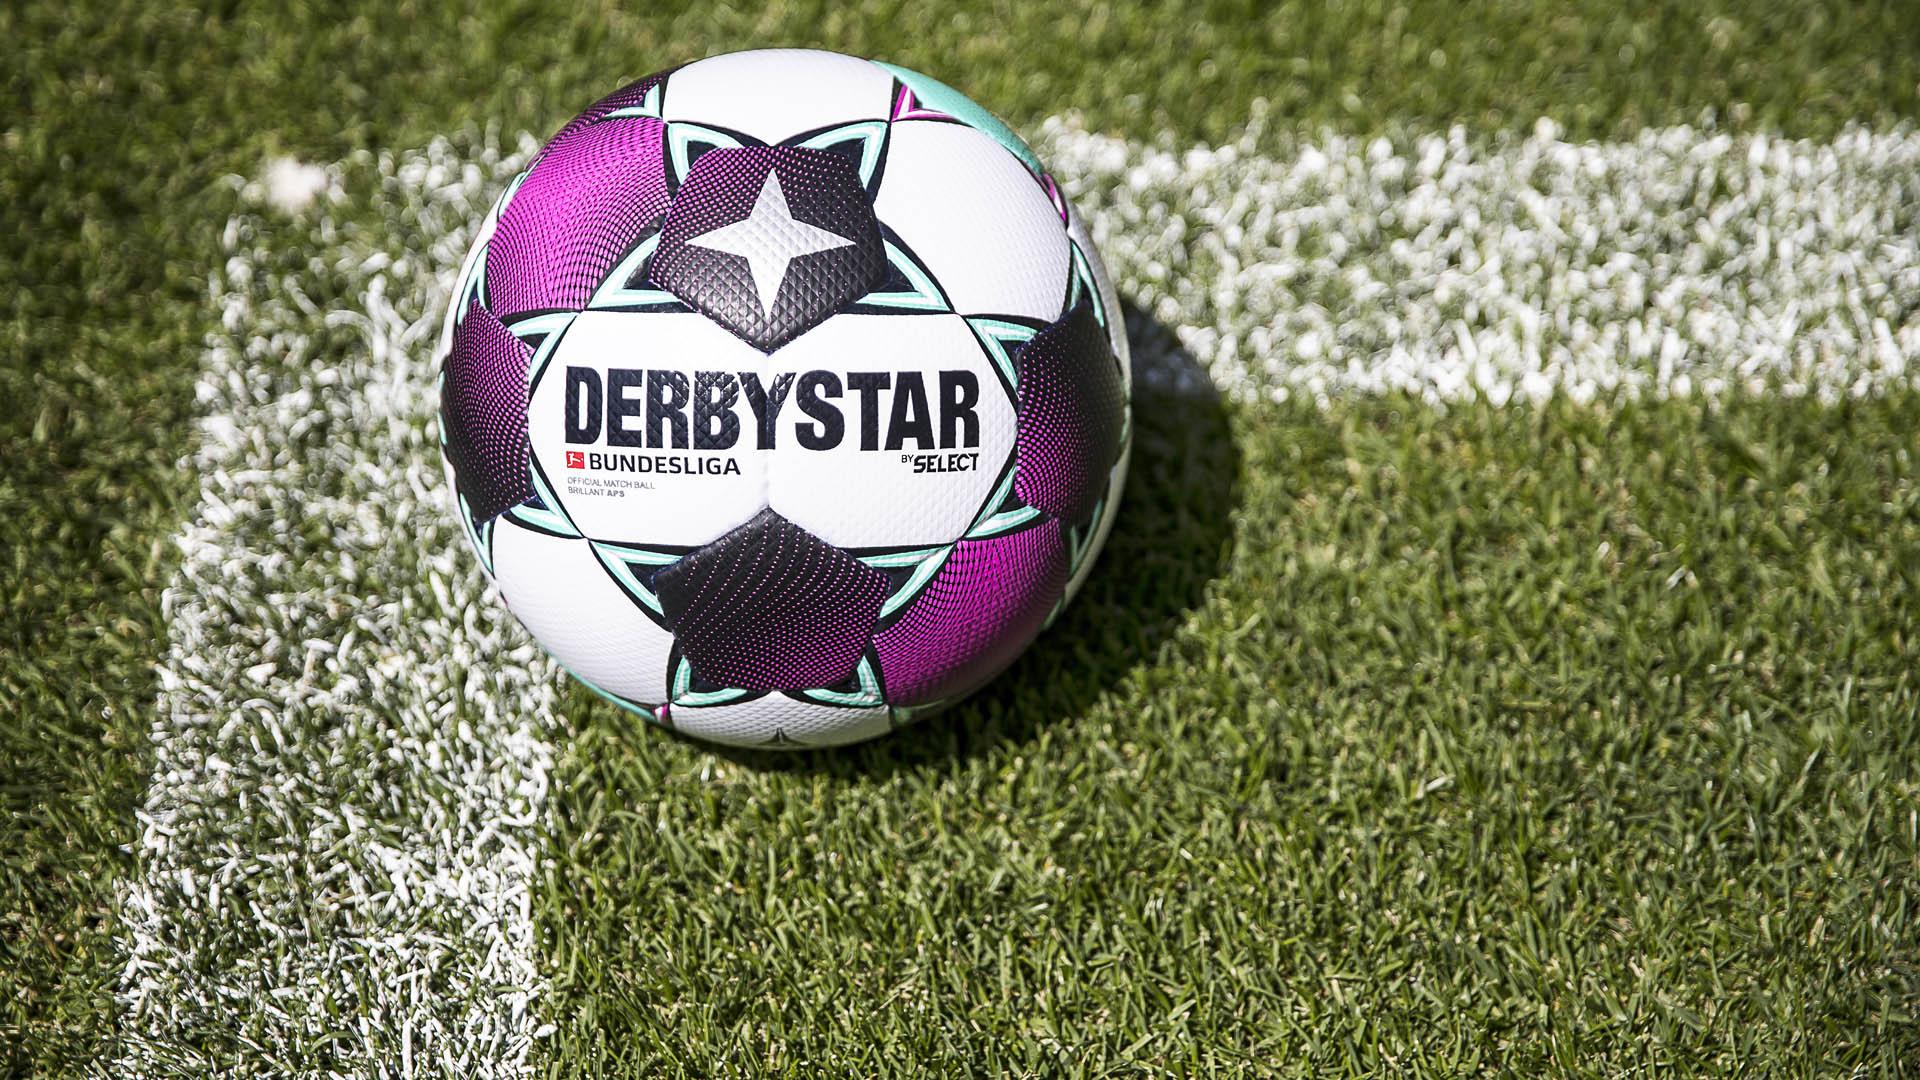 New calendar for 2020 21 season released – Bundesliga and